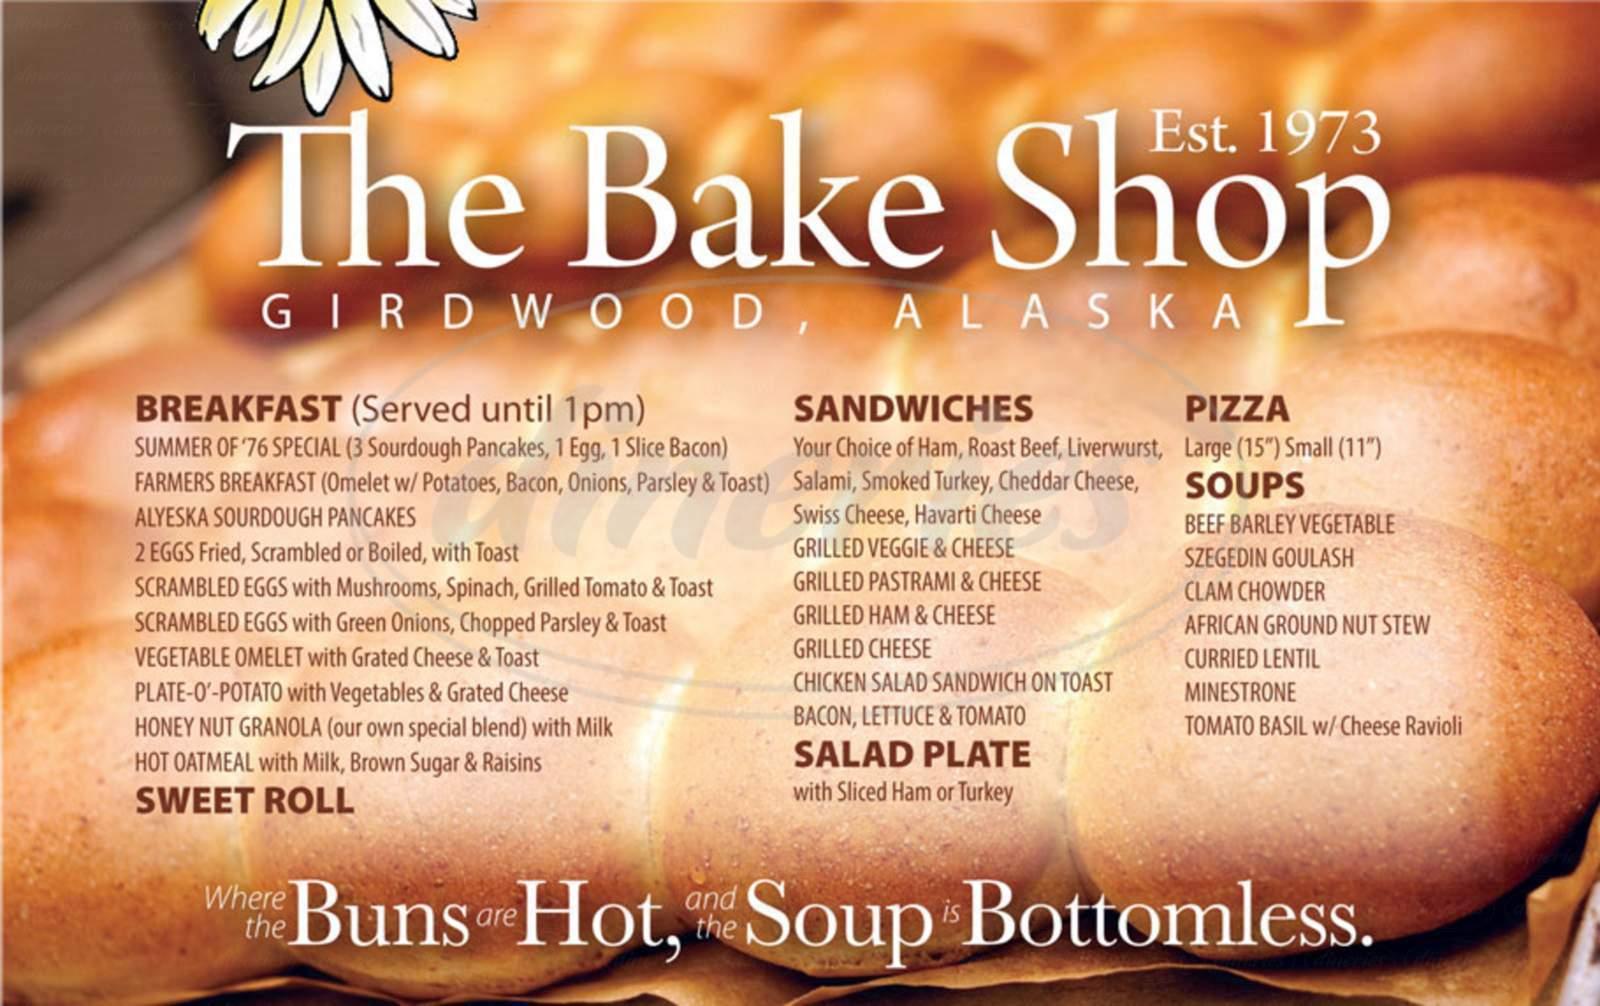 menu for The Bake Shop